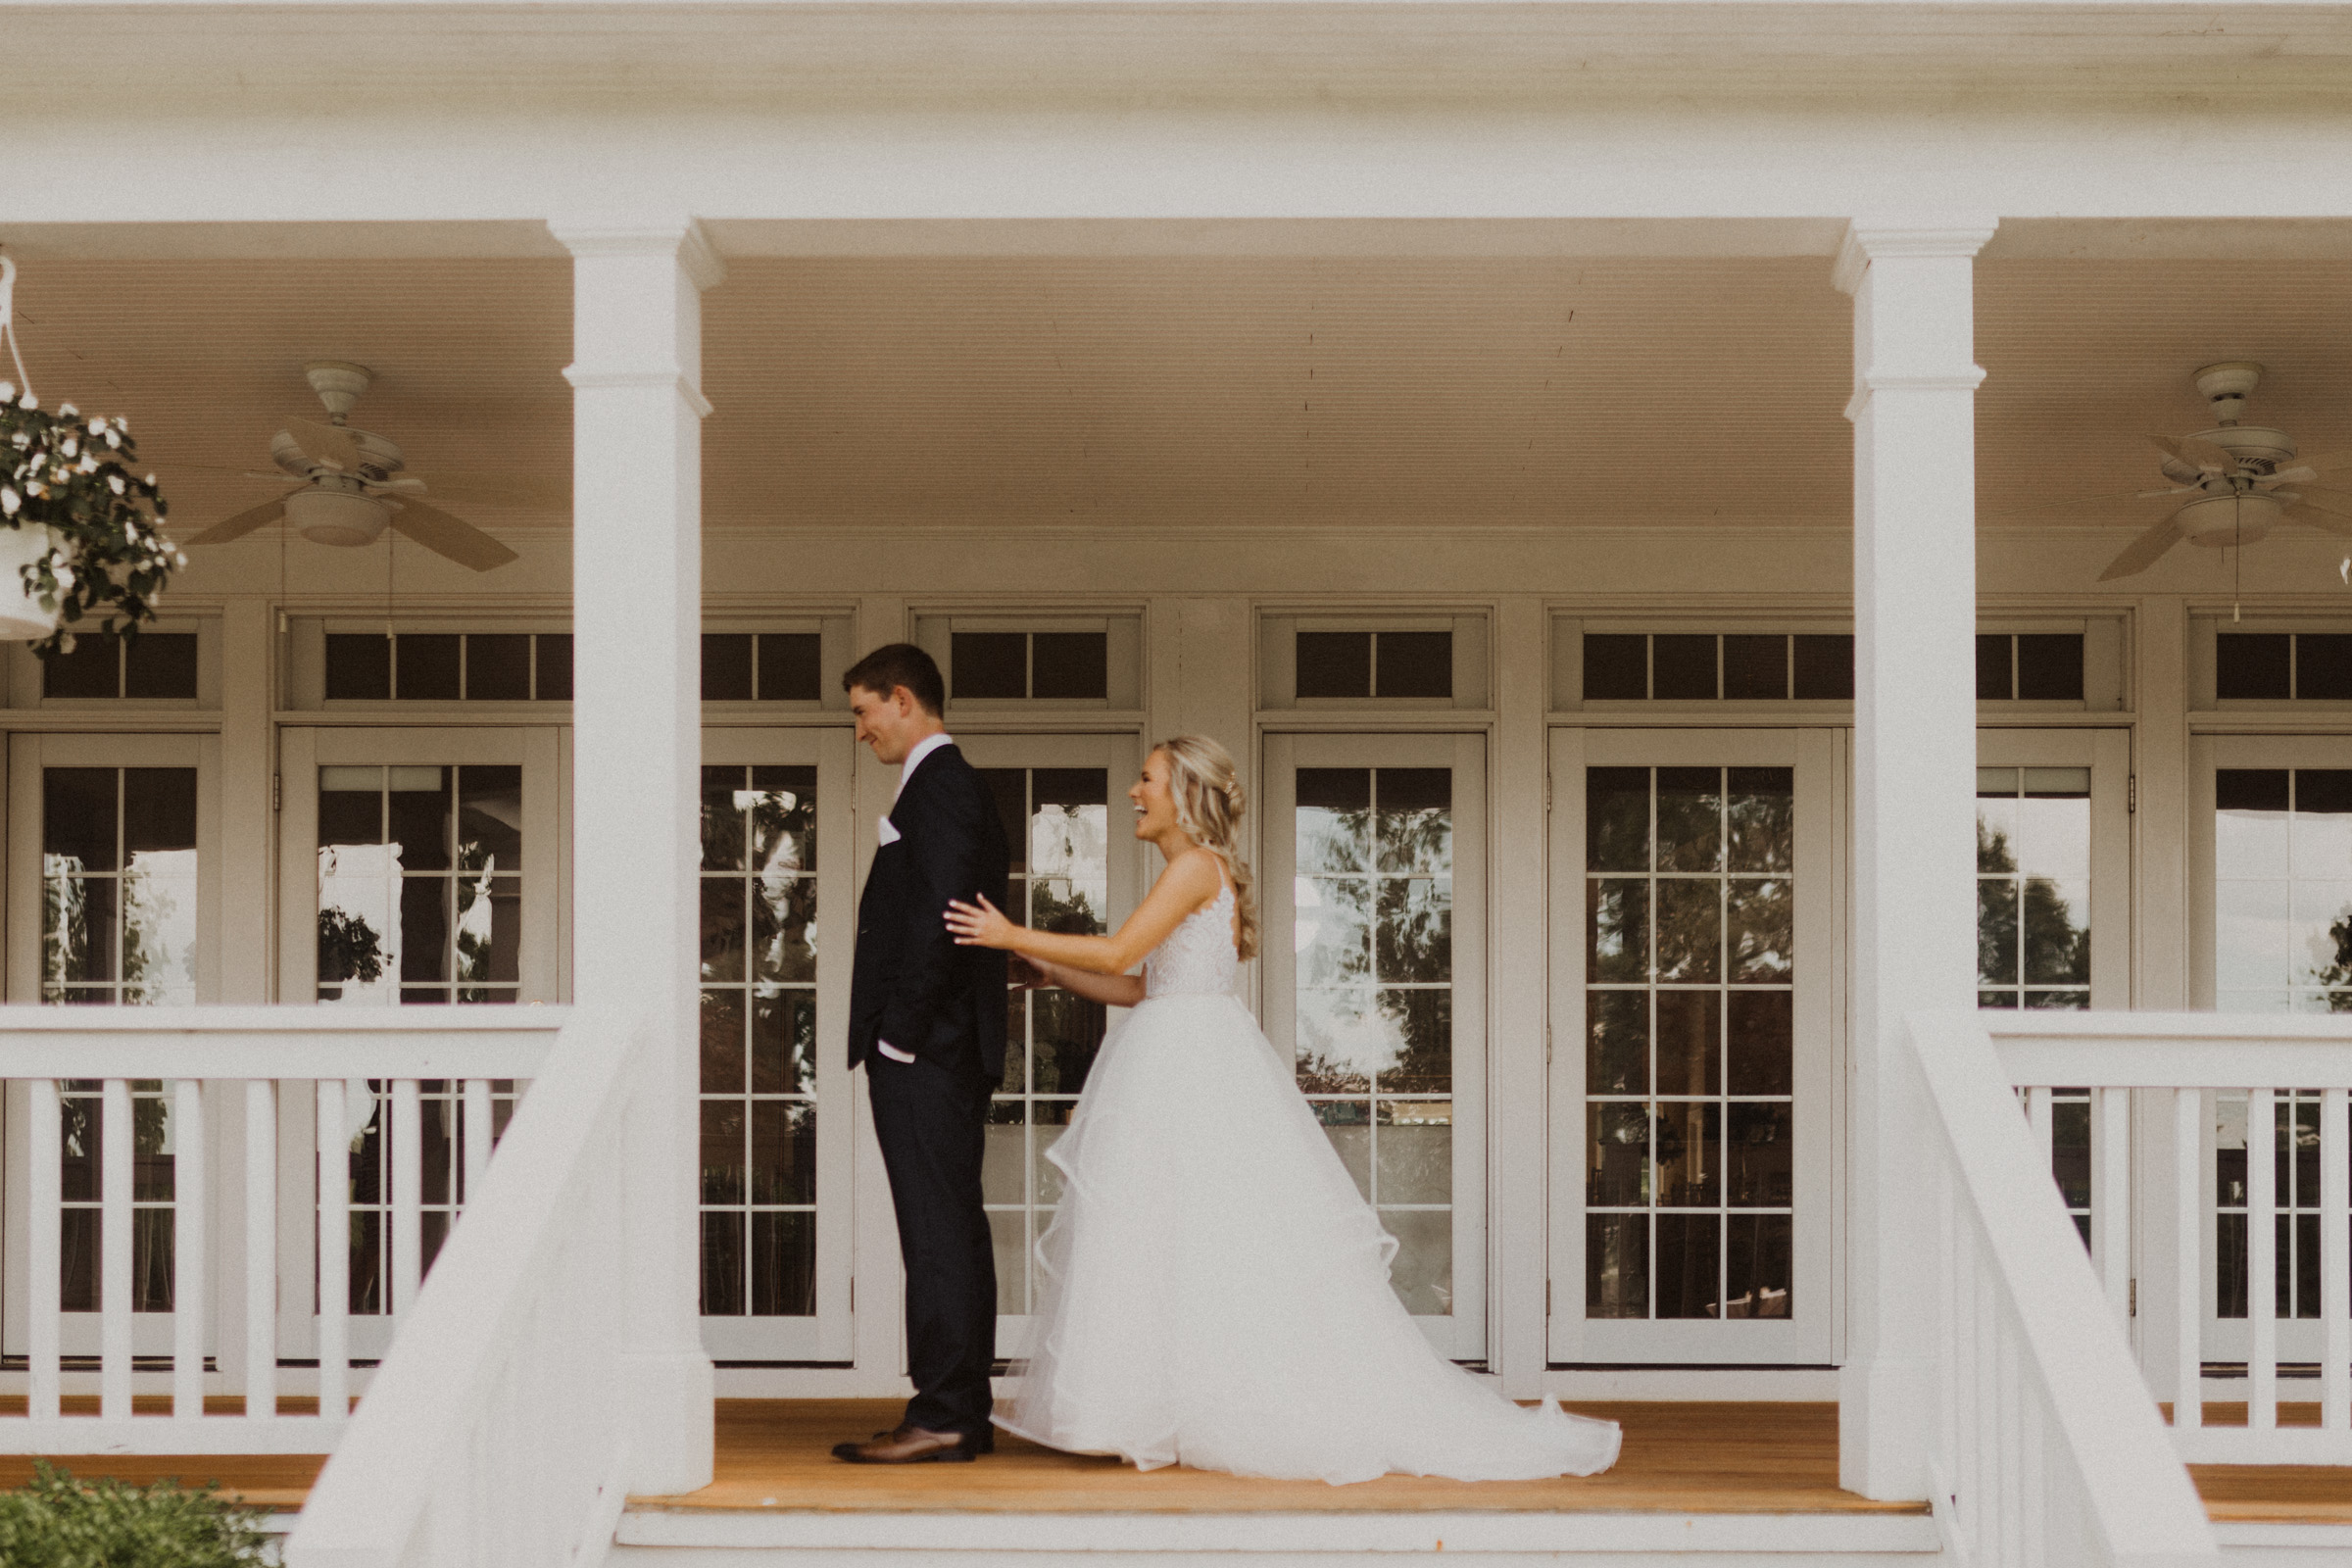 alyssa barletter photography hawthorne house summer outdoor wedding southern charm inspiration-18.jpg